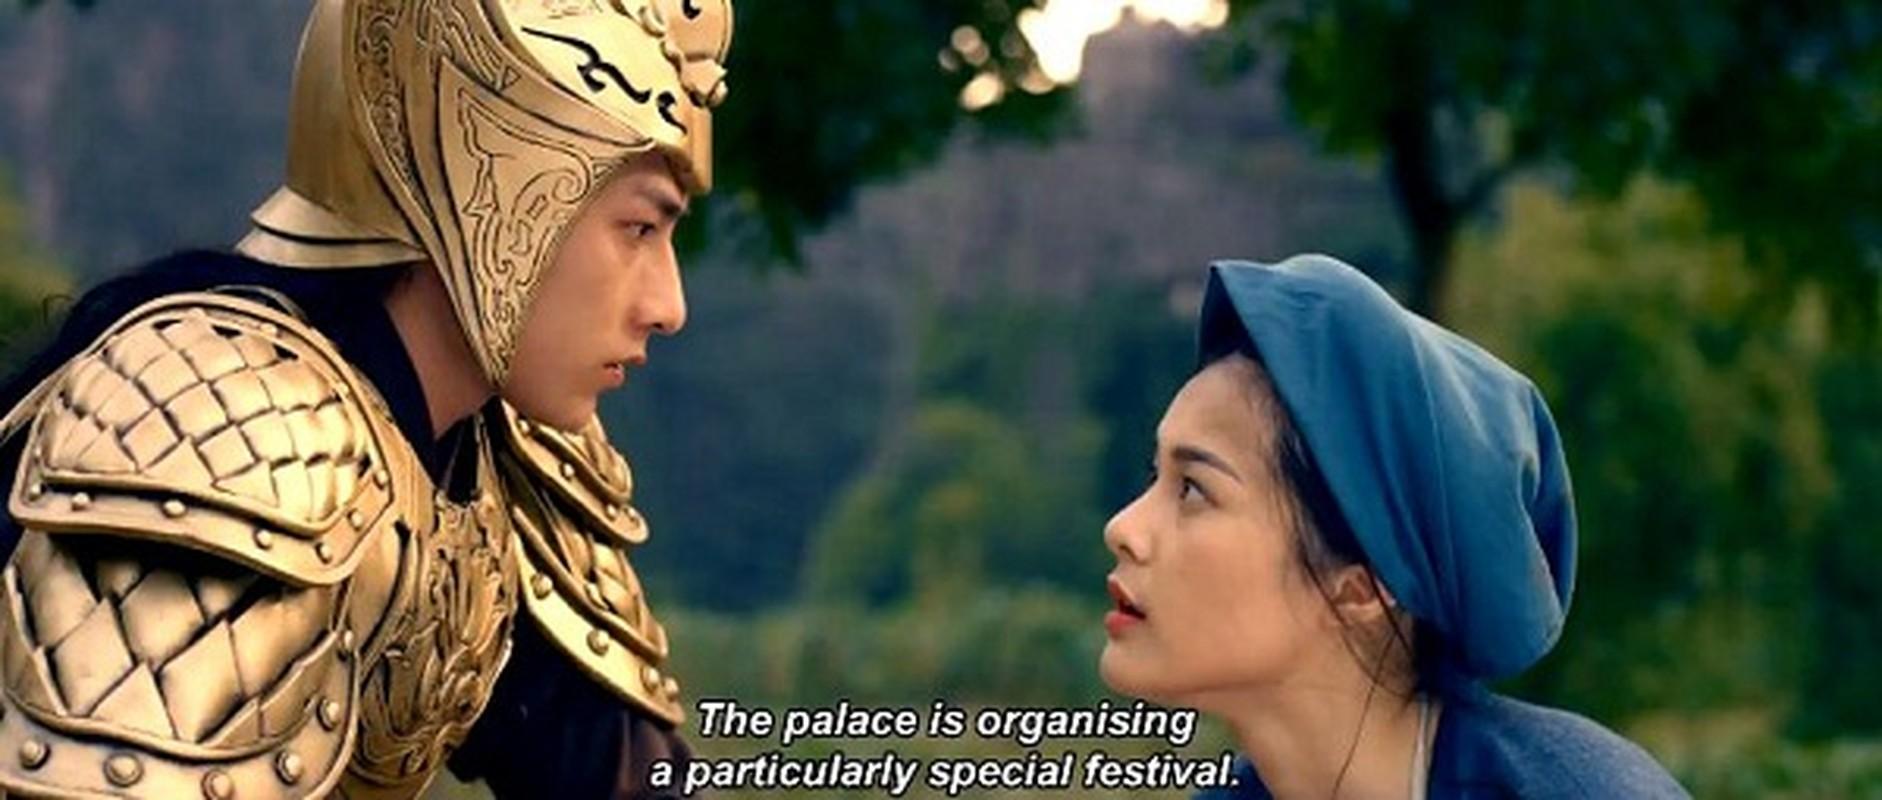 Phim Tam Cam Ngo Thanh Van khoac chiec ao qua rong-Hinh-12